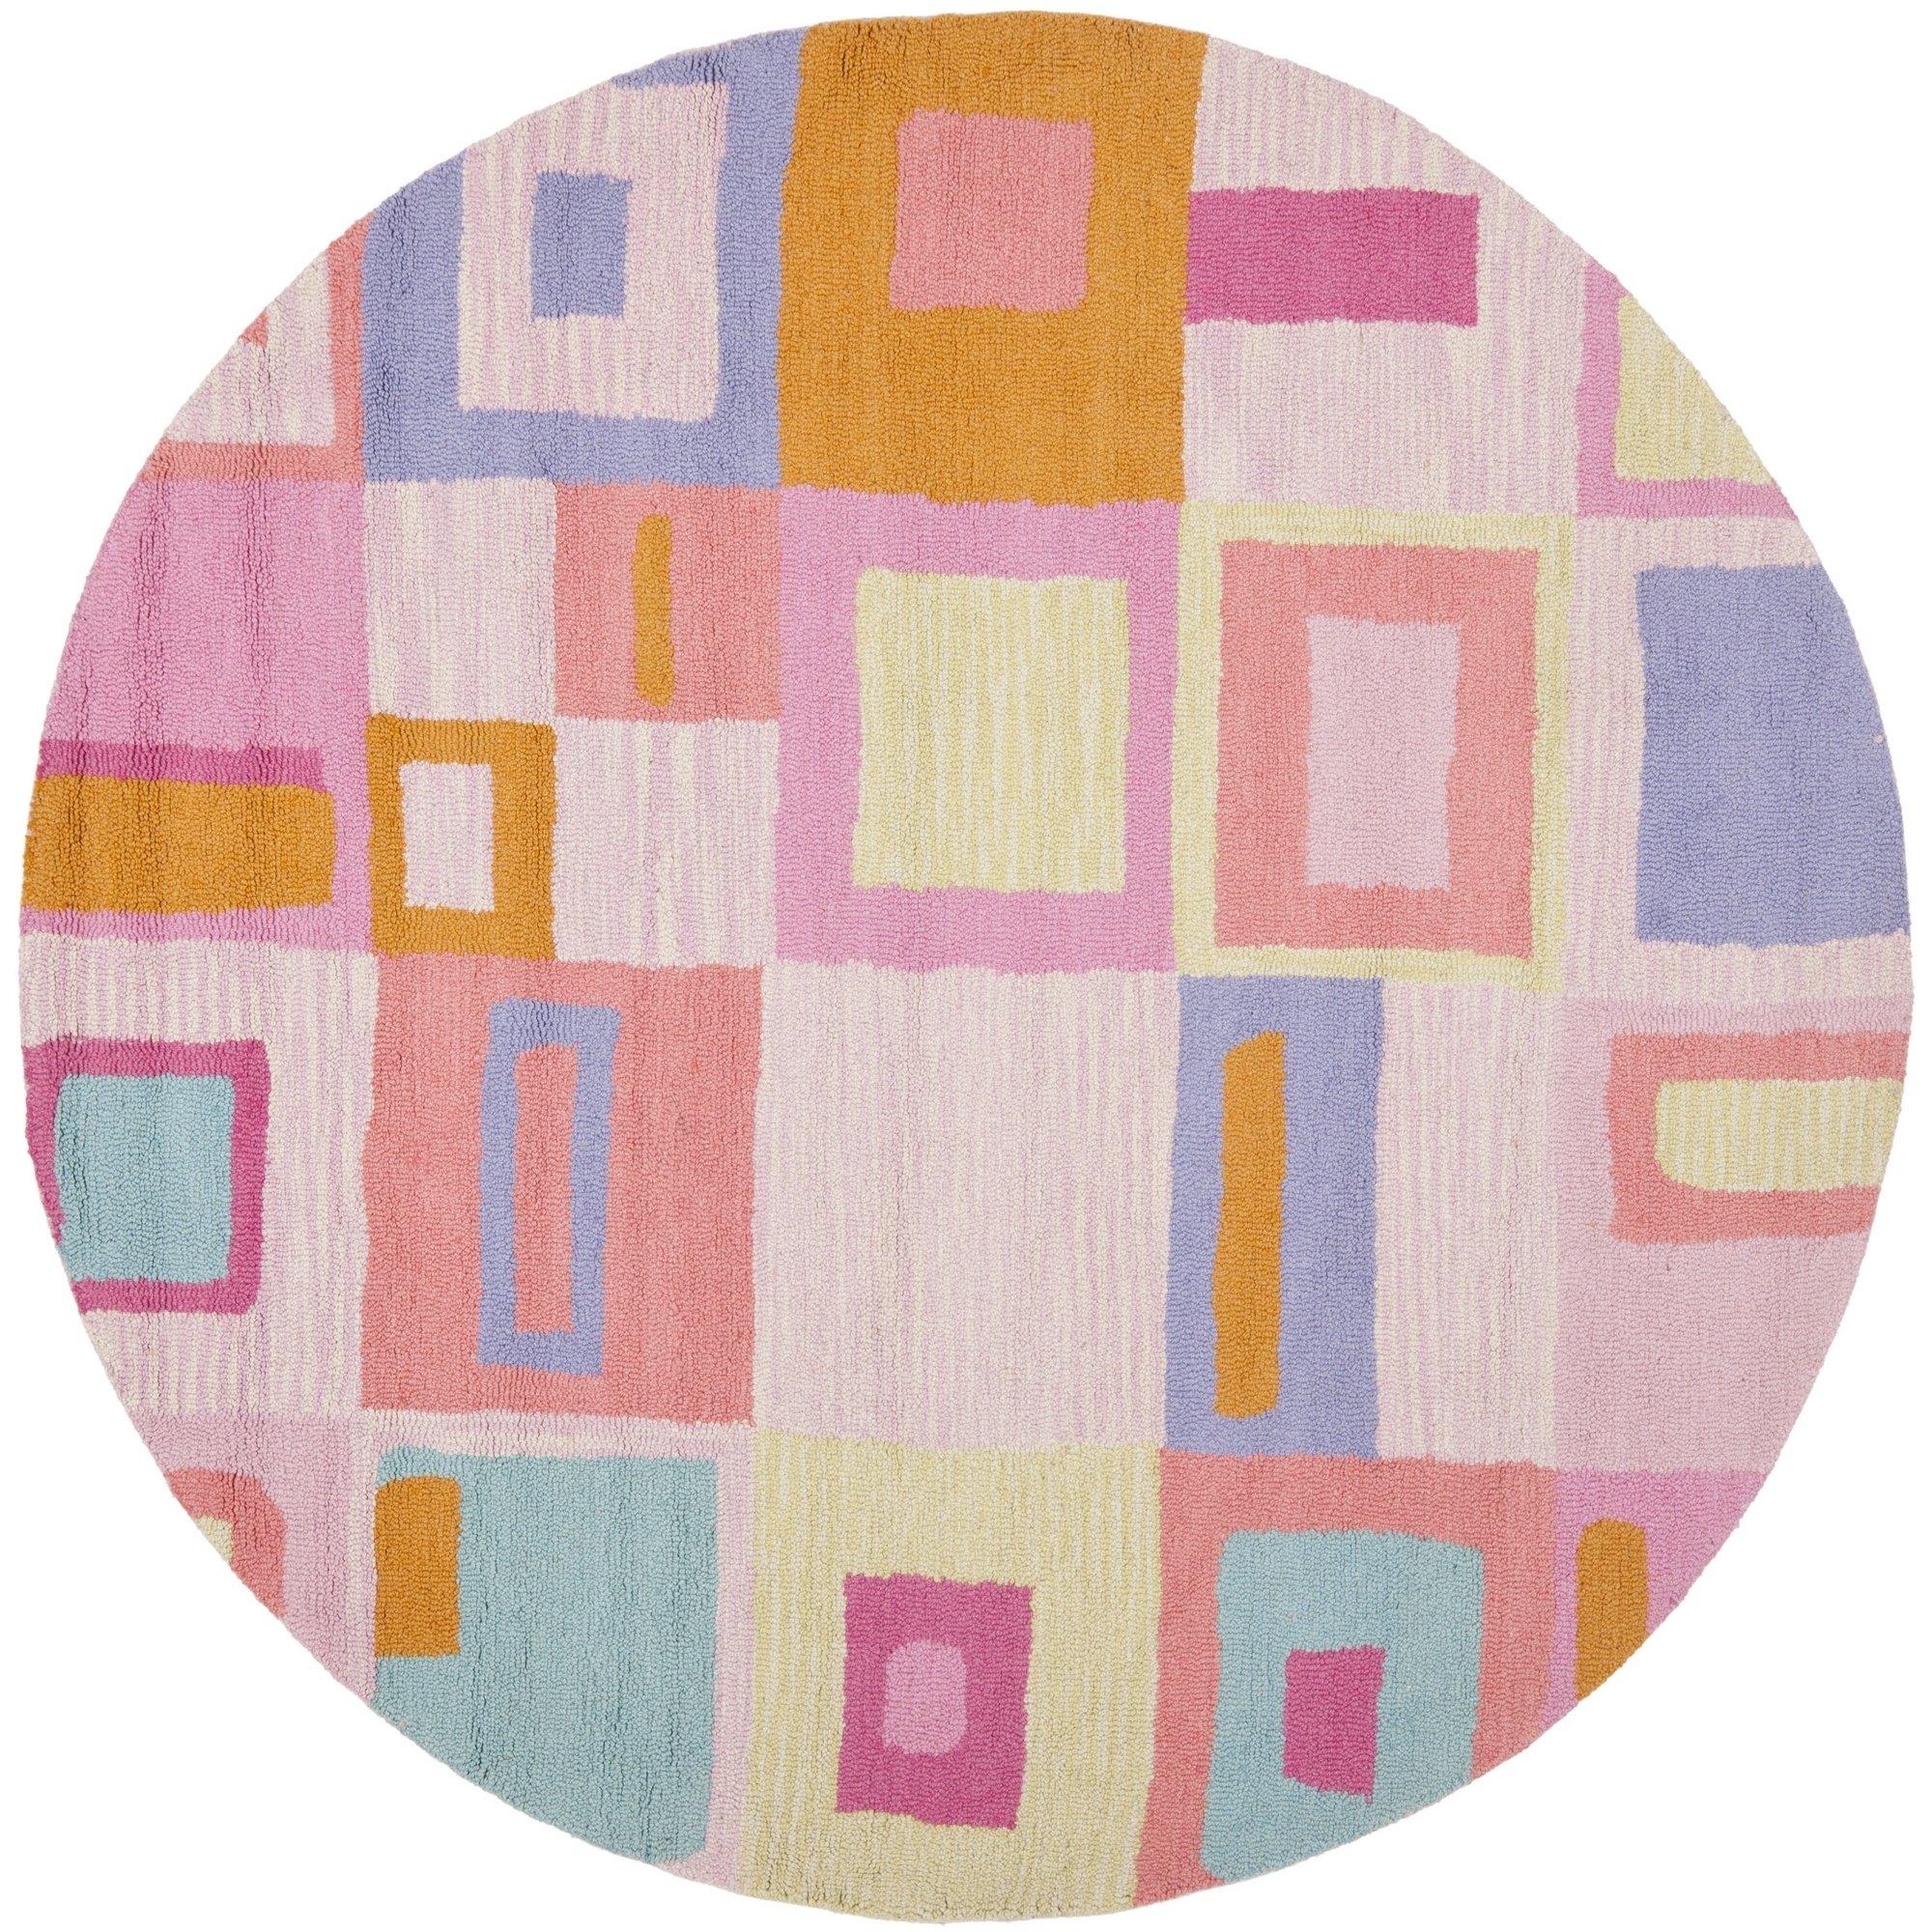 Safavieh Safavieh Kids Collection SFK317A Handmade Pink and Multi Cotton Round Area Rug (6' Diameter)